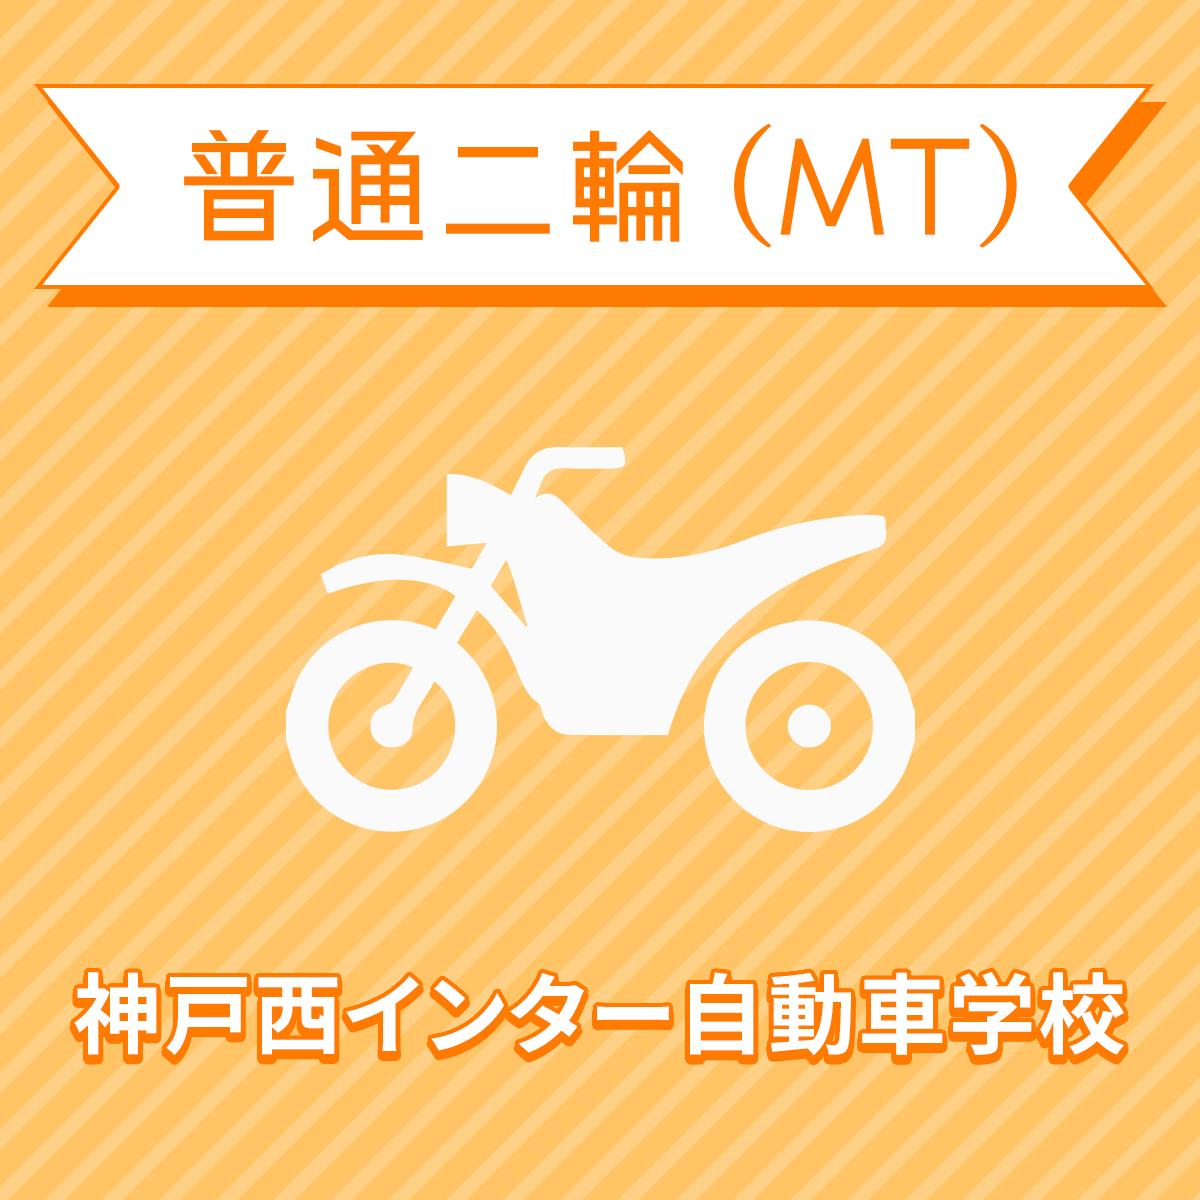 【兵庫県神戸市】普通二輪MTコース(一般料金)<免許なし/原付免許所持対象>